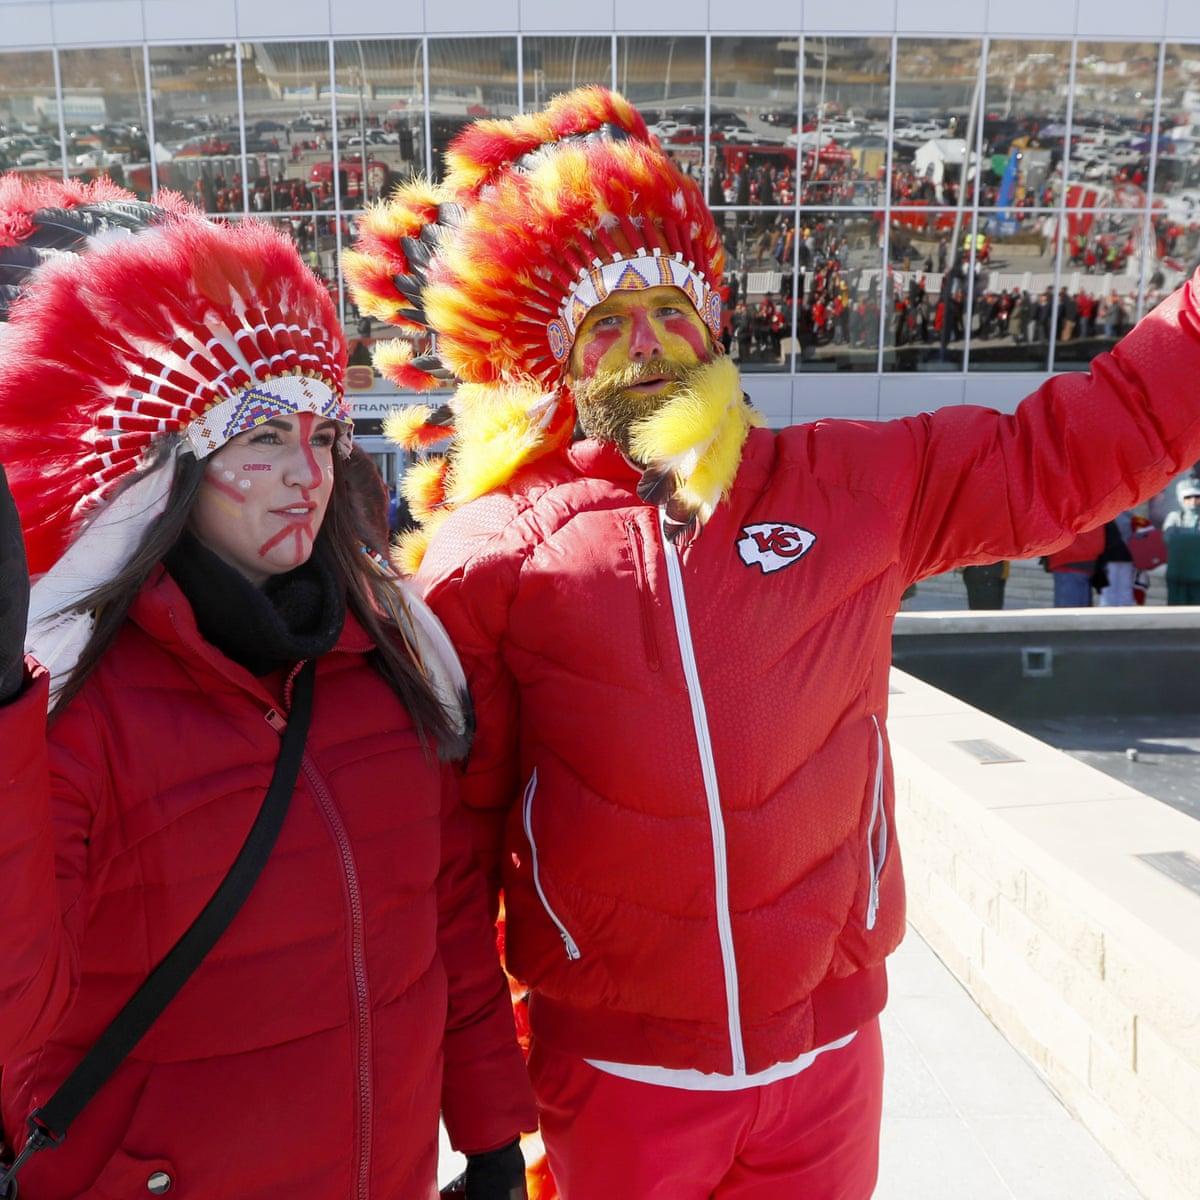 Kansas City Chiefs To Prohibit Native American Imagery At Arrowhead Kansas City Chiefs The Guardian